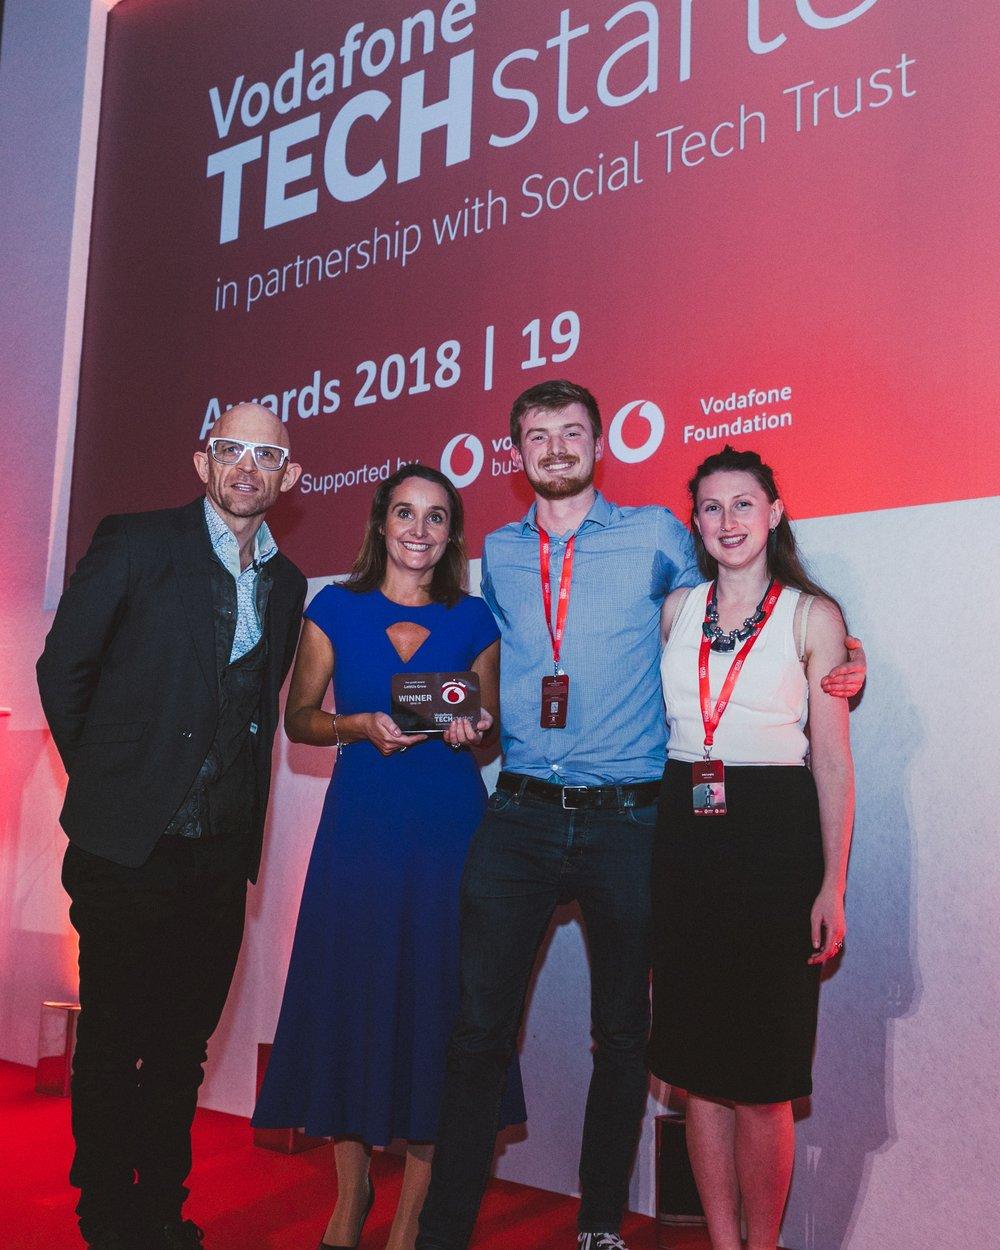 l to r - TV presenter Jason, Bradbury, Anne Sheehan of Vodafone, with Jack Farmer and India Langley of LettUs Grow_f.jpg